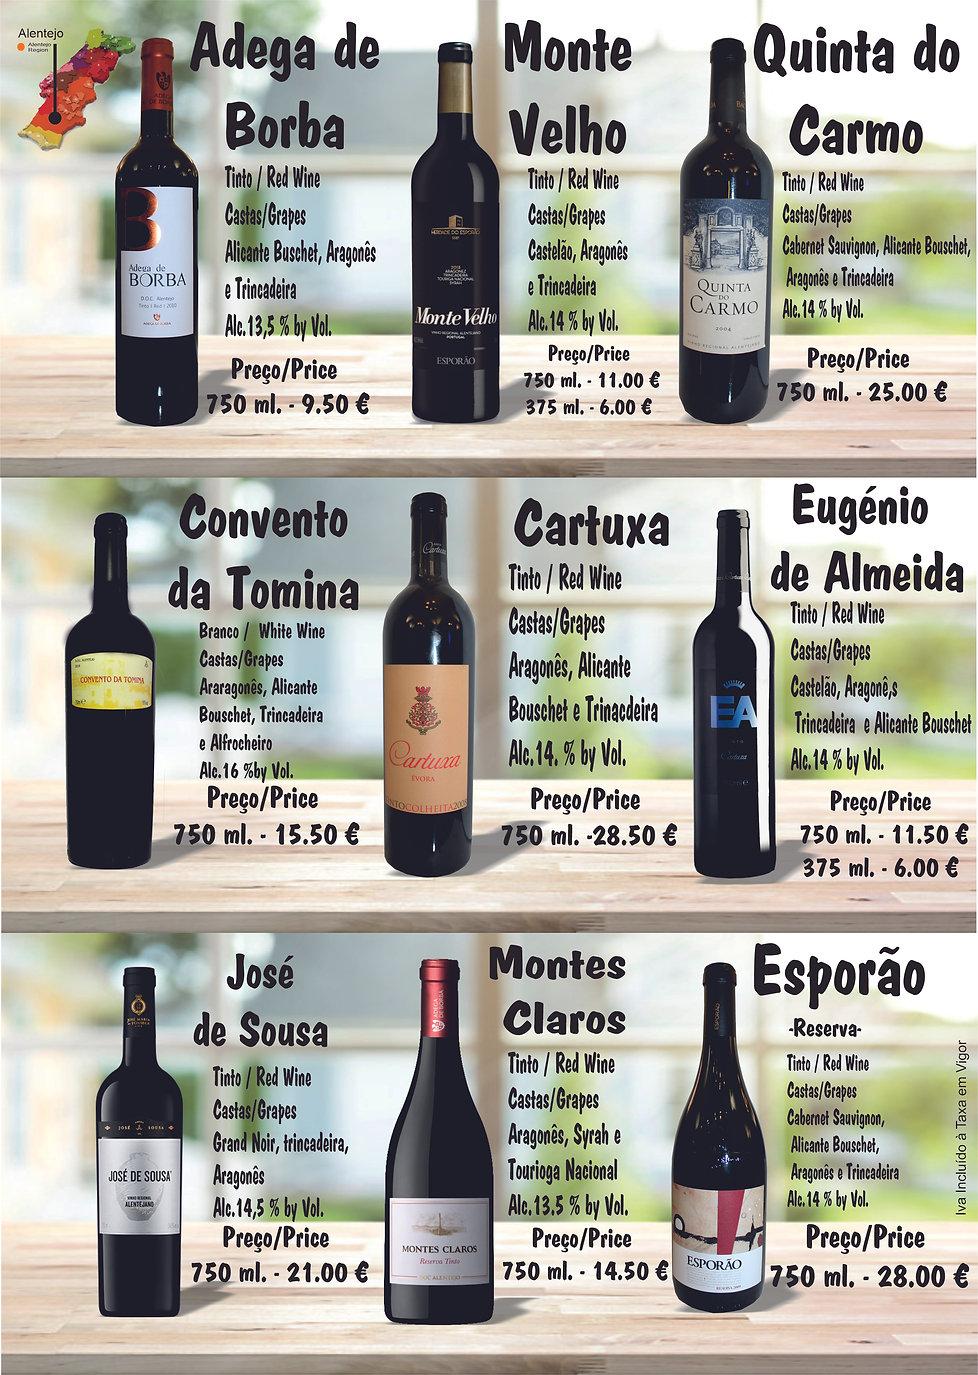 Carta de Vinhos 2020- Alentejo 1.jpg